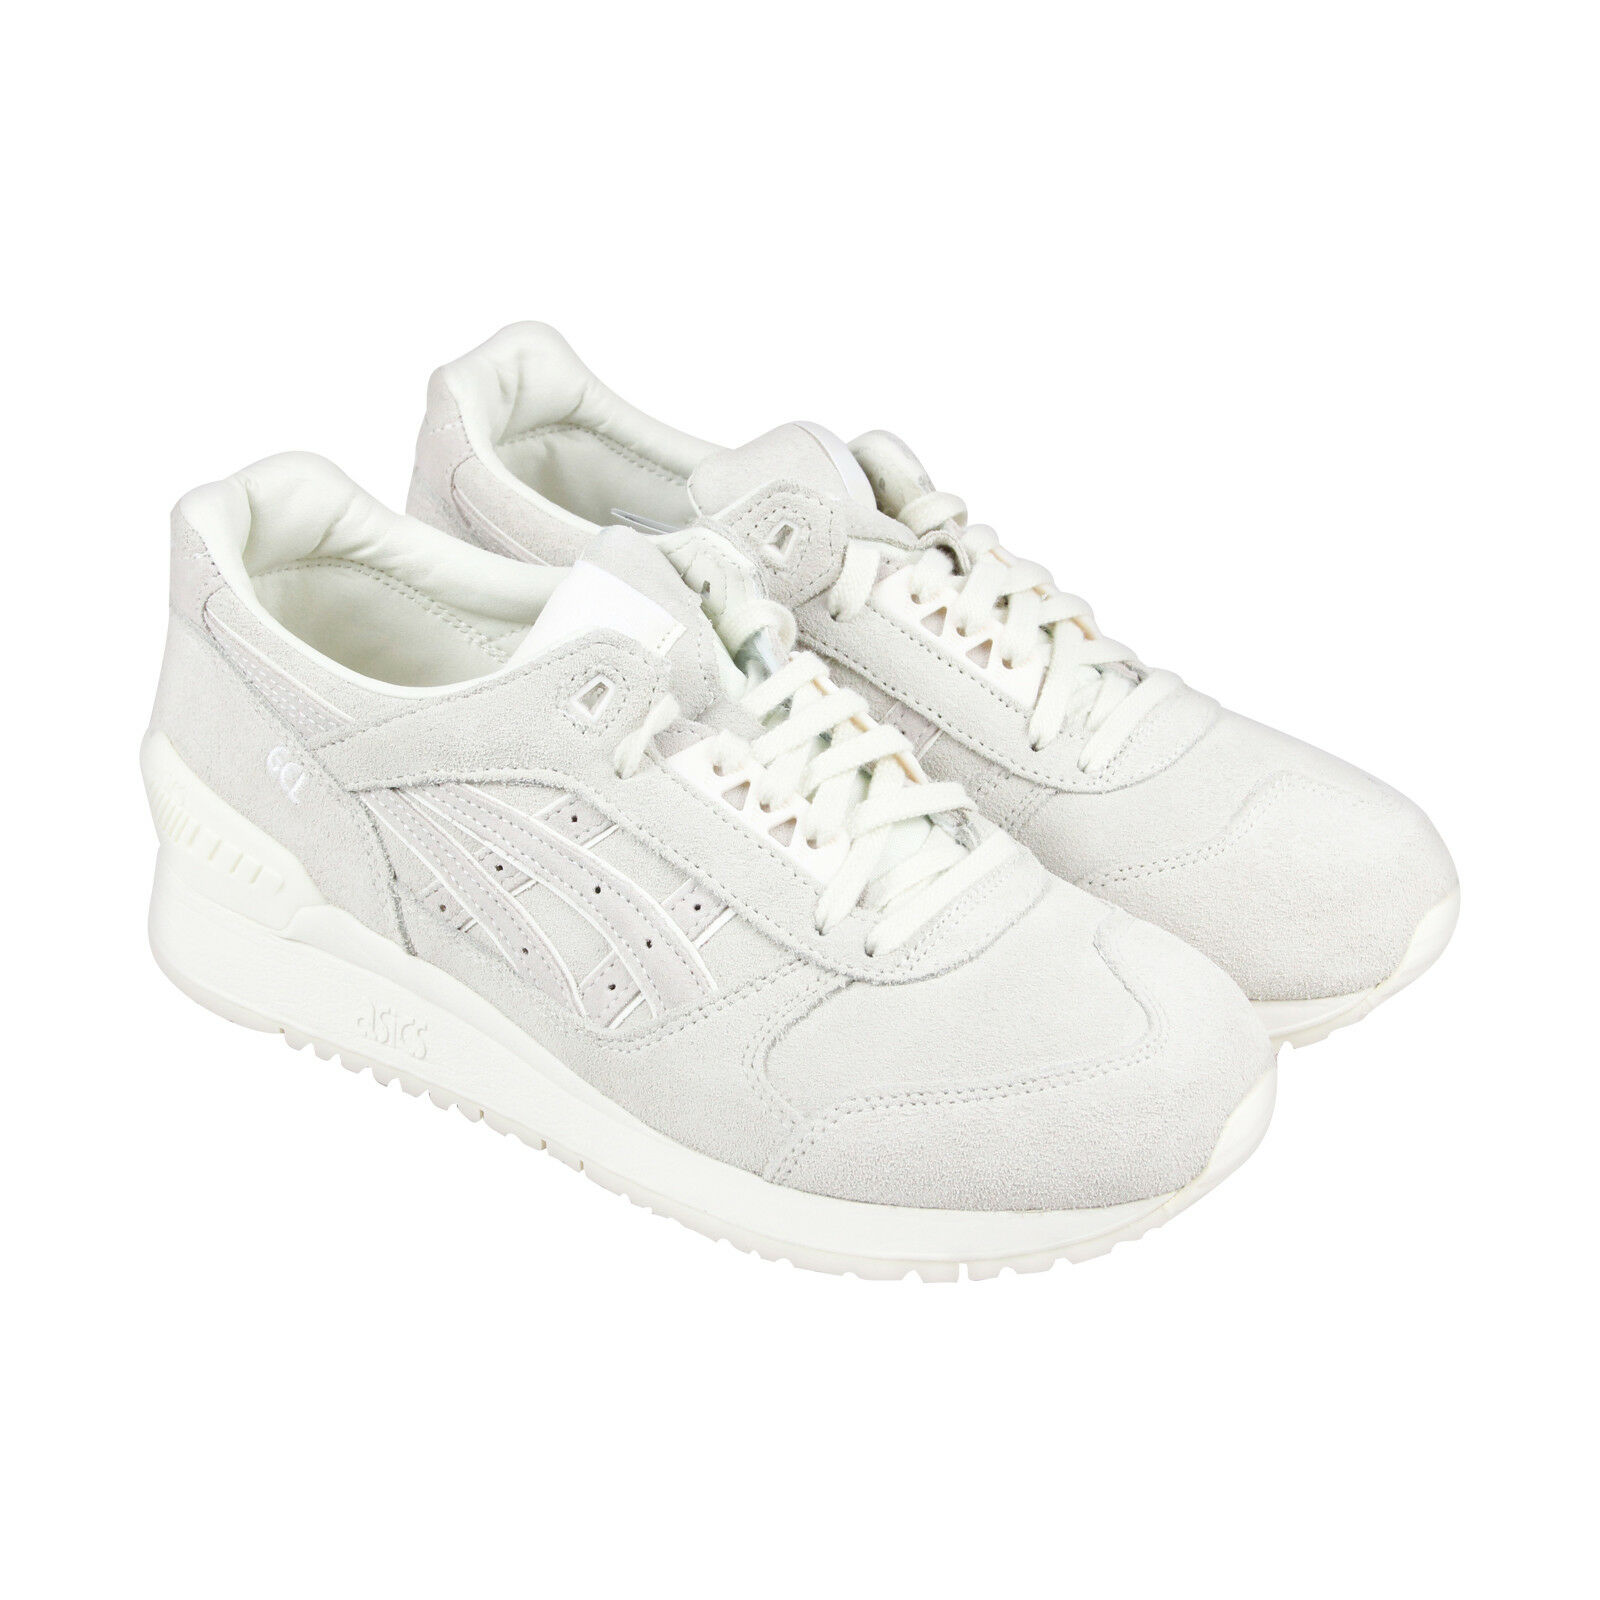 Asics Gel-Respector July 4th Pack Mens Lifestyle Sneakers  H6U3L-9999  130